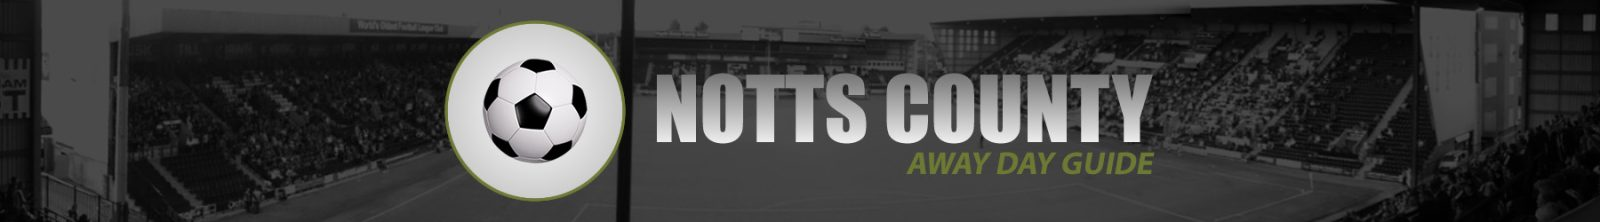 Notts County Away